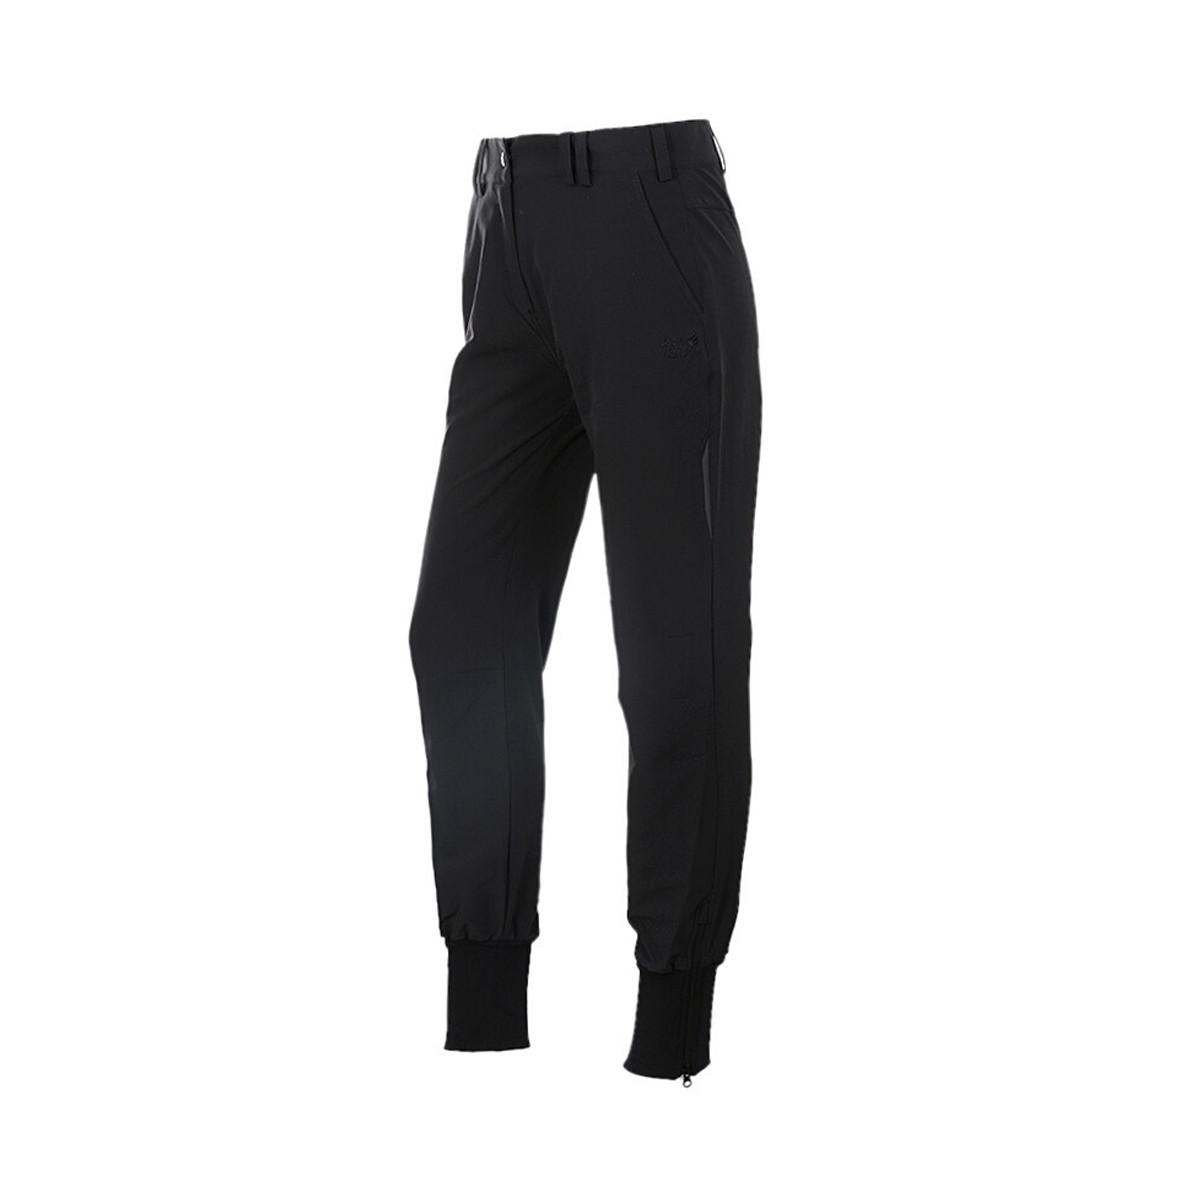 Jack Wolfskin 狼爪 173-5012601-6000 女士运动长裤